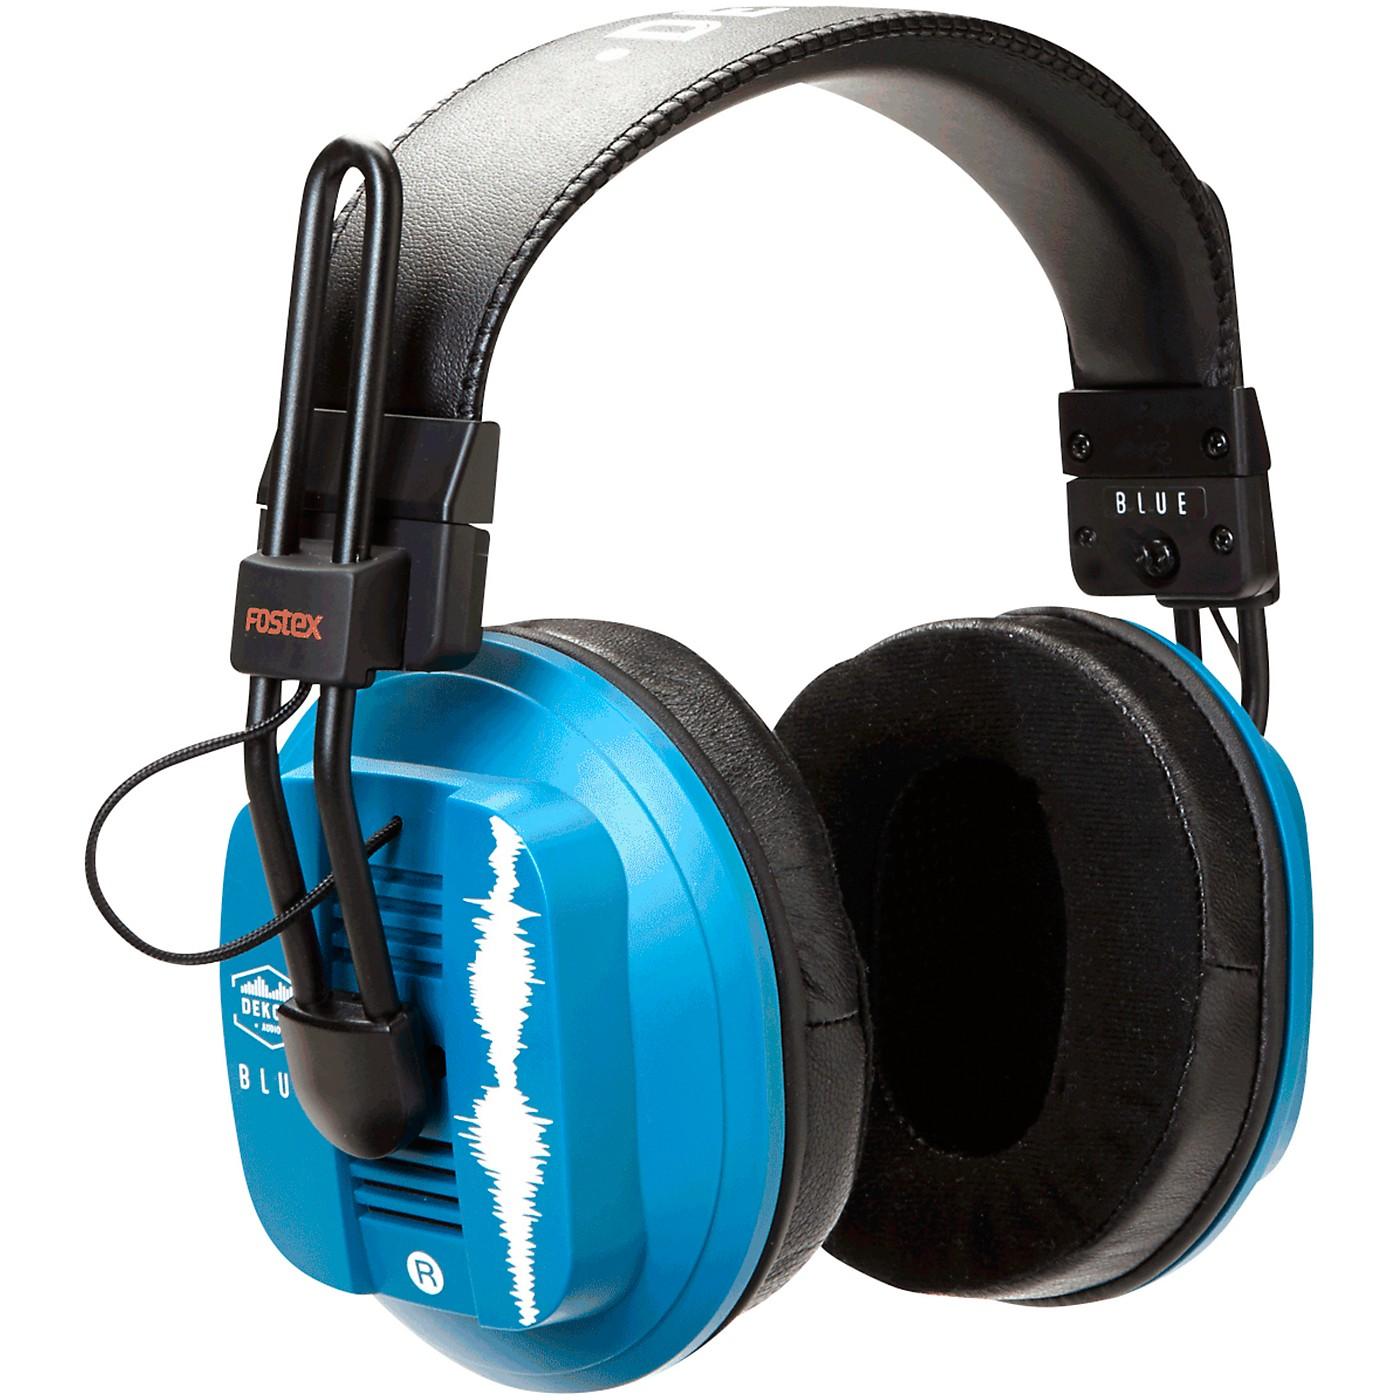 Dekoni Audio Blue Fostex/Dekoni HiFi Audiophile Planar Magnetic Headphone thumbnail